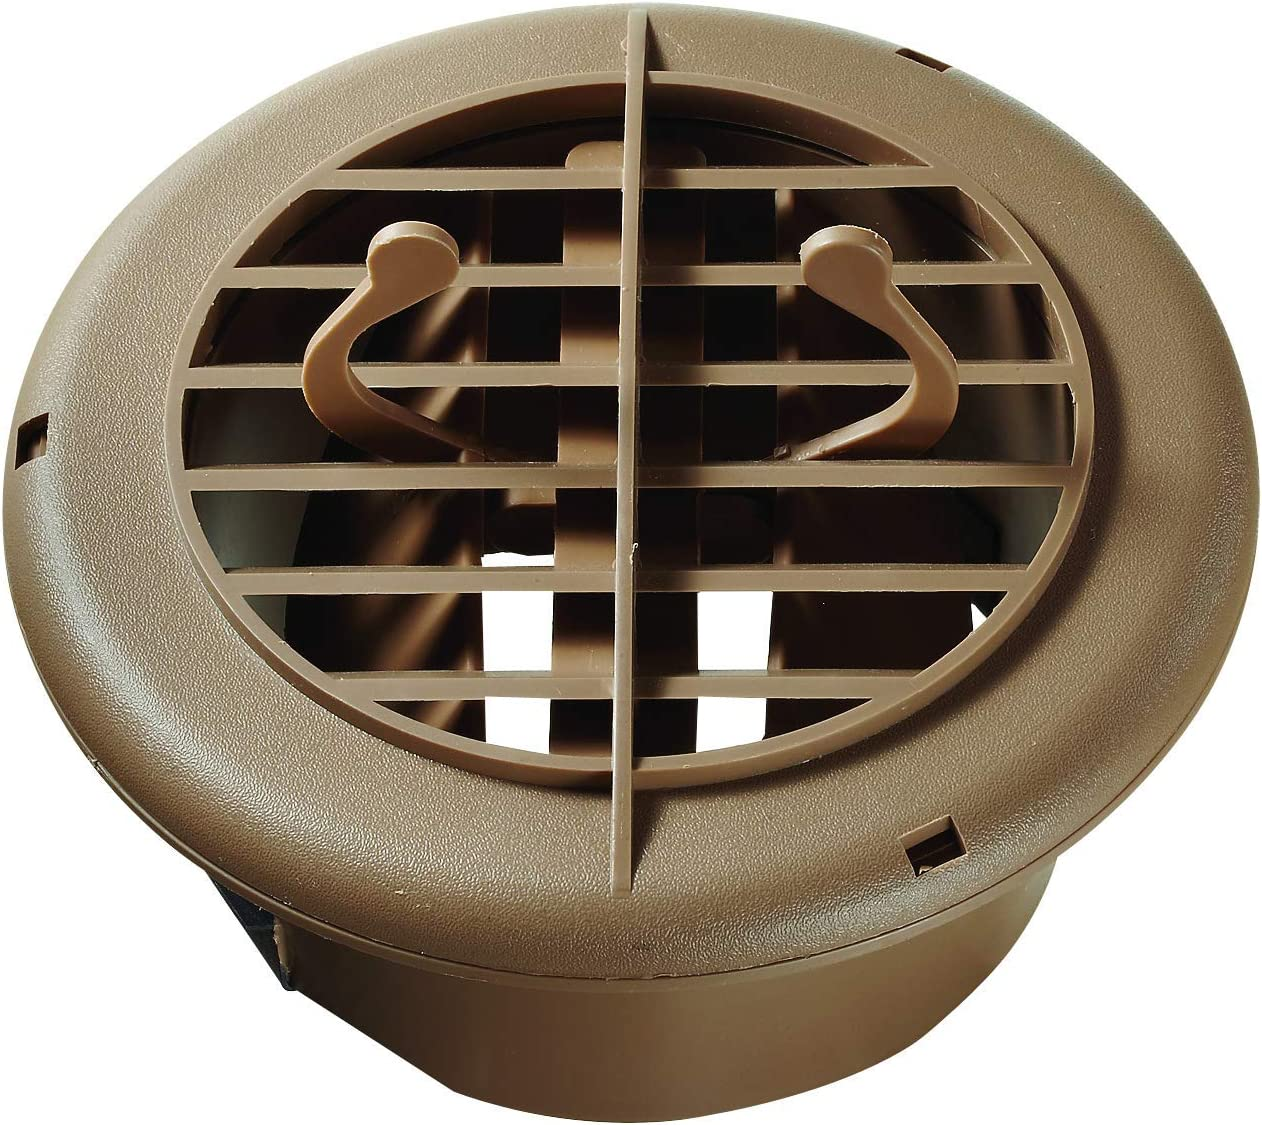 RV Designer H810 Provent Dampened Vent - Beige